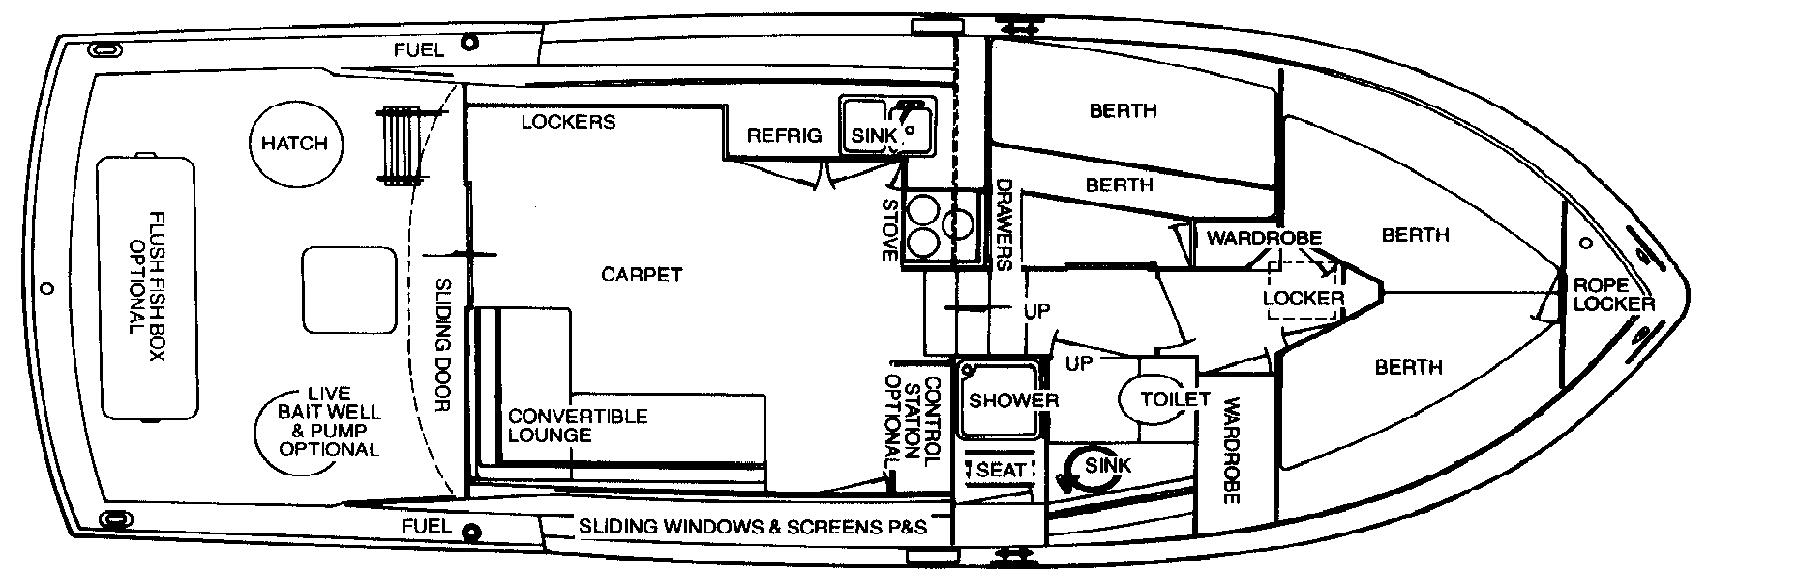 36 Sports Cruiser; 36-360 Commander Floor Plan 2